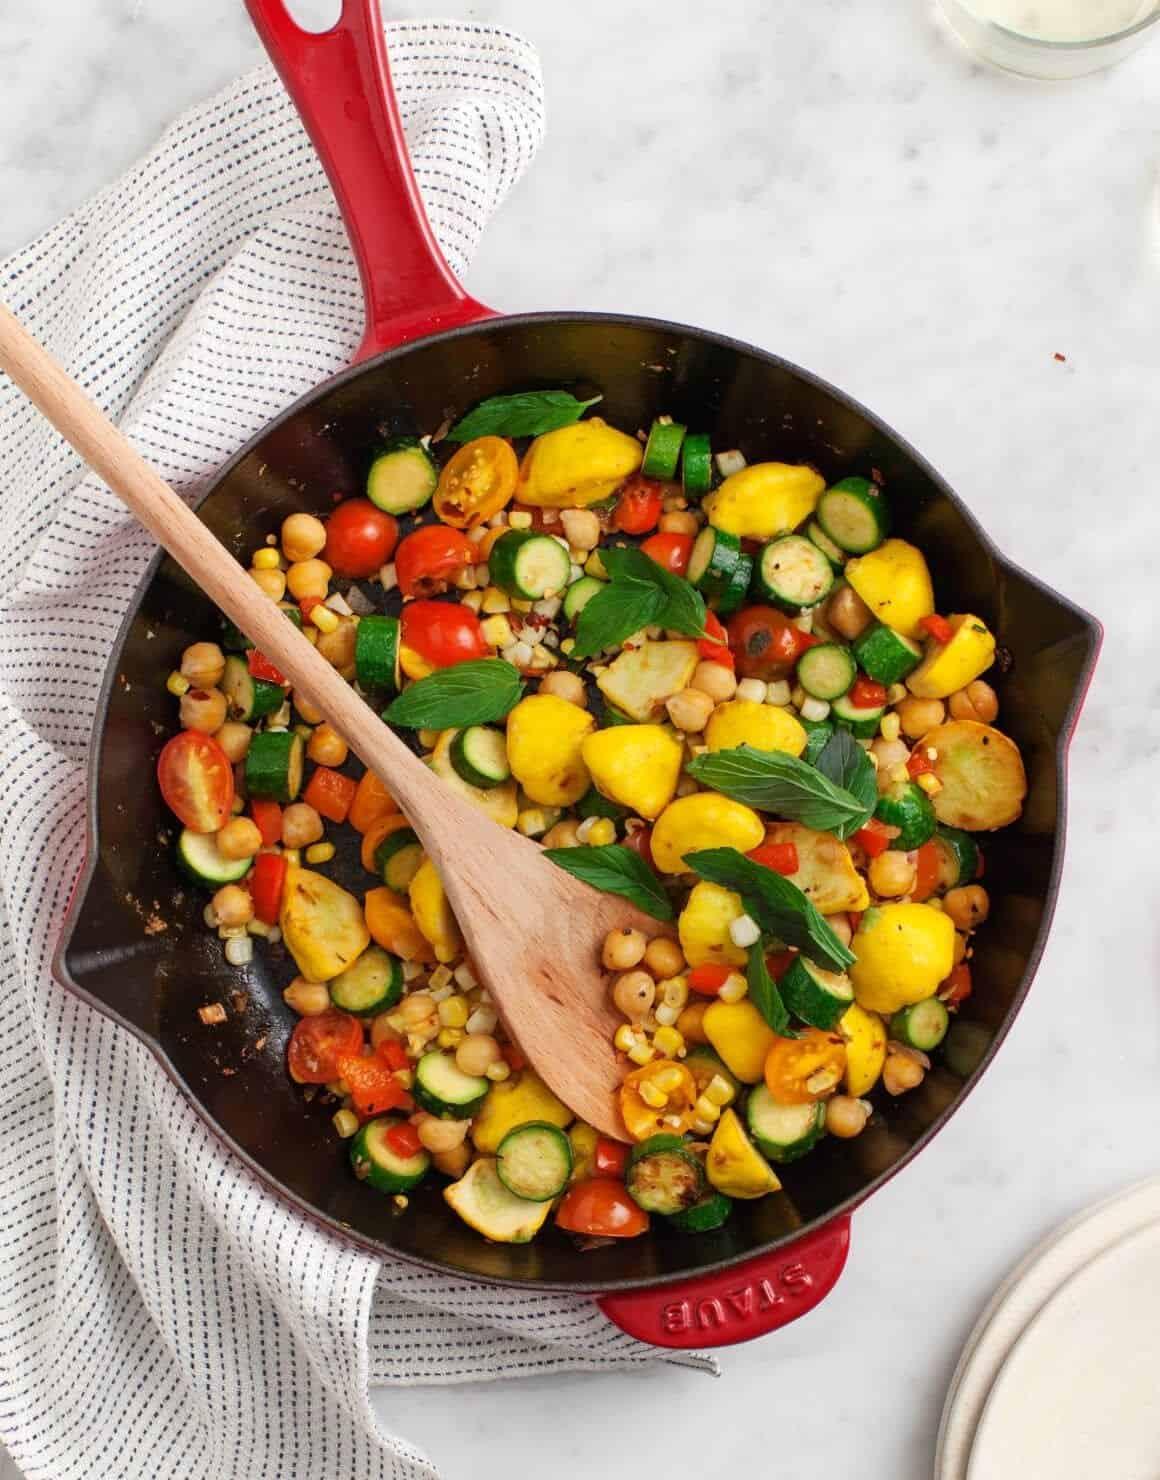 Summer Squash Succotash from The Love & Lemons Cookbook